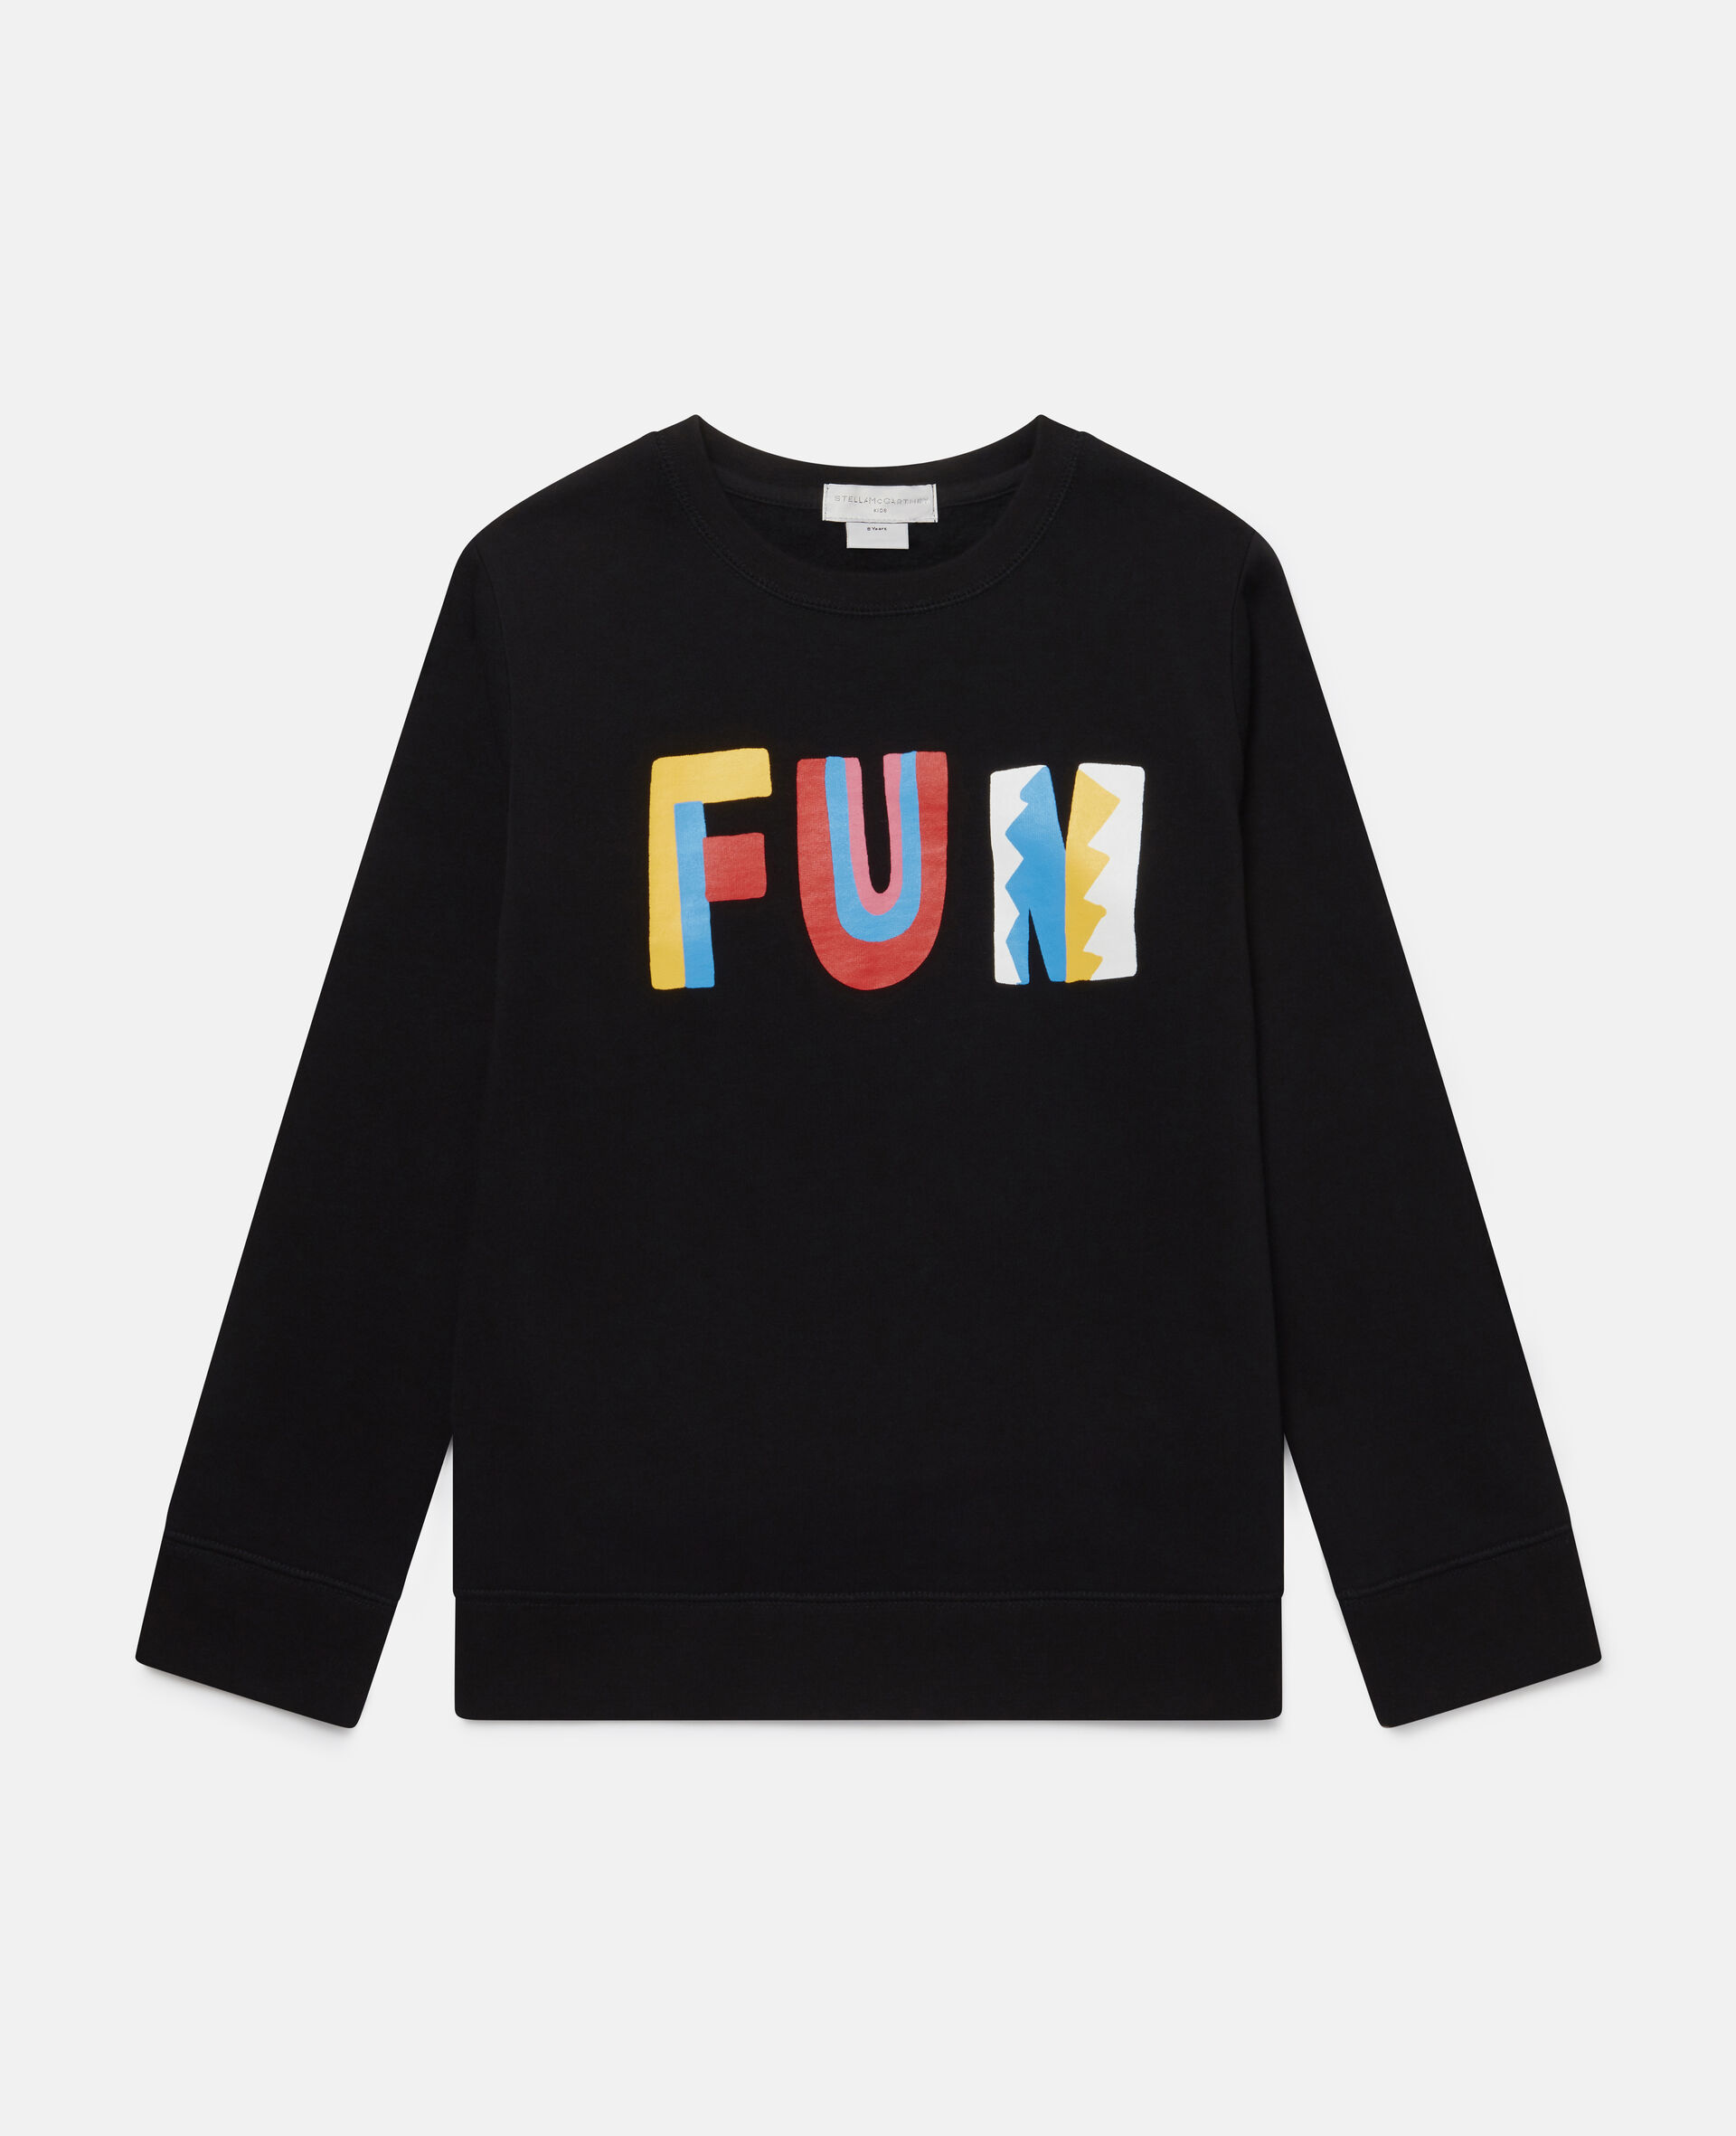 Fun Oversize Cotton Fleece Sweatshirt -Black-large image number 0